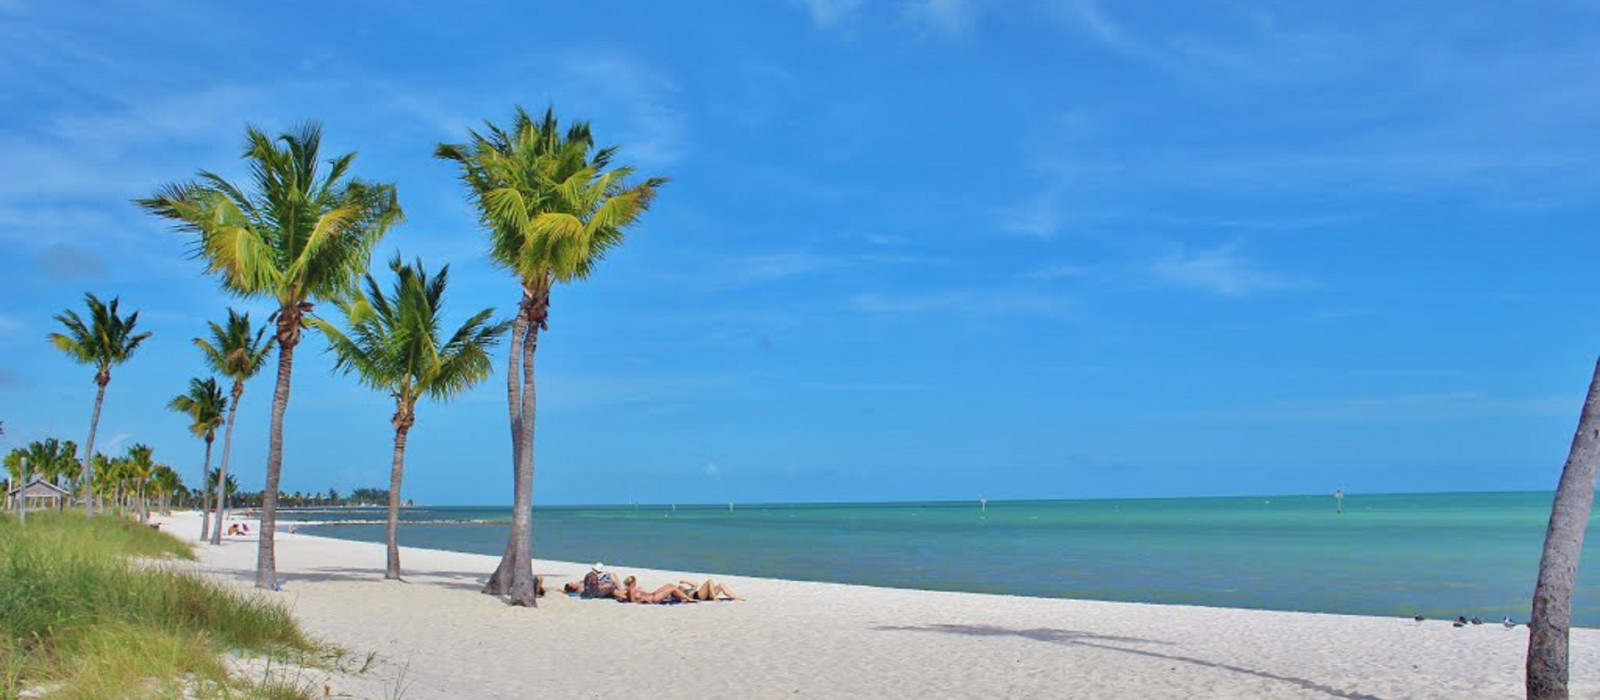 Destination Key West USA